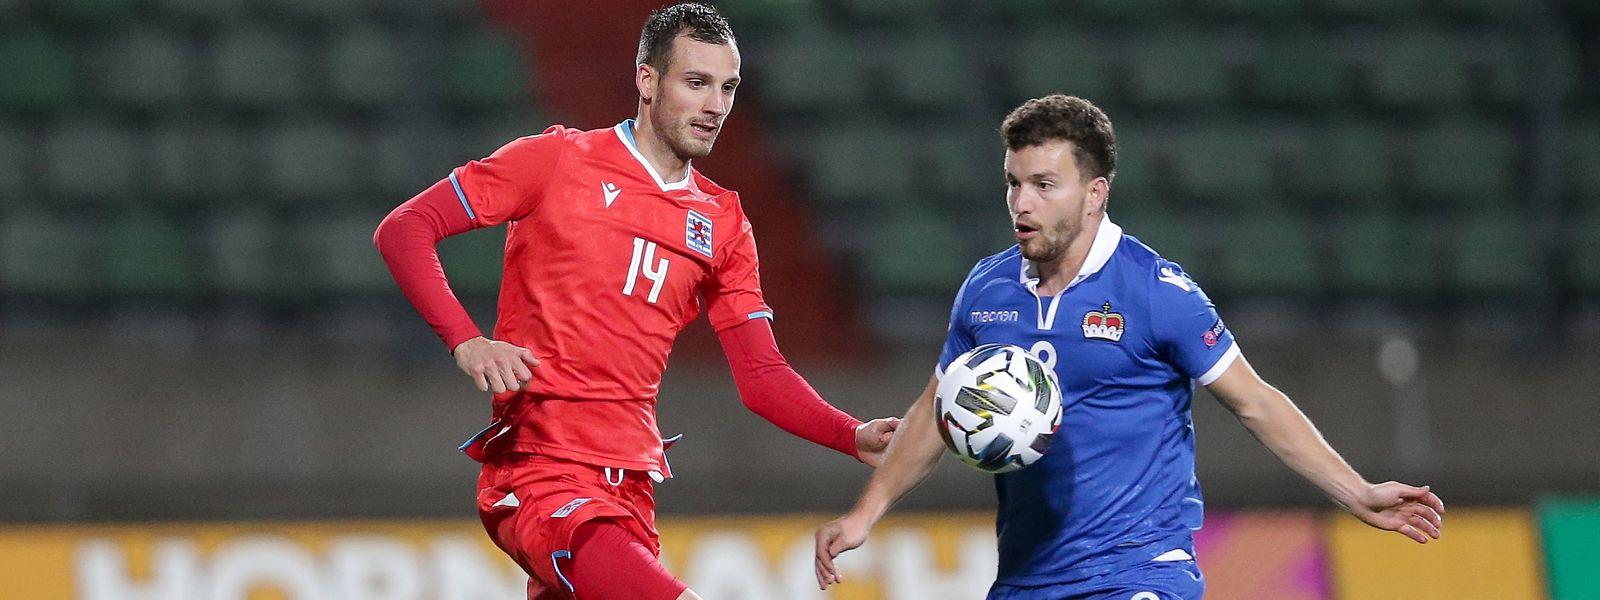 Stefano Bensi, hier gegen Liechtensteins Aron Sele (r.), ist aus der Nationalmannschaft zurückgetreten.